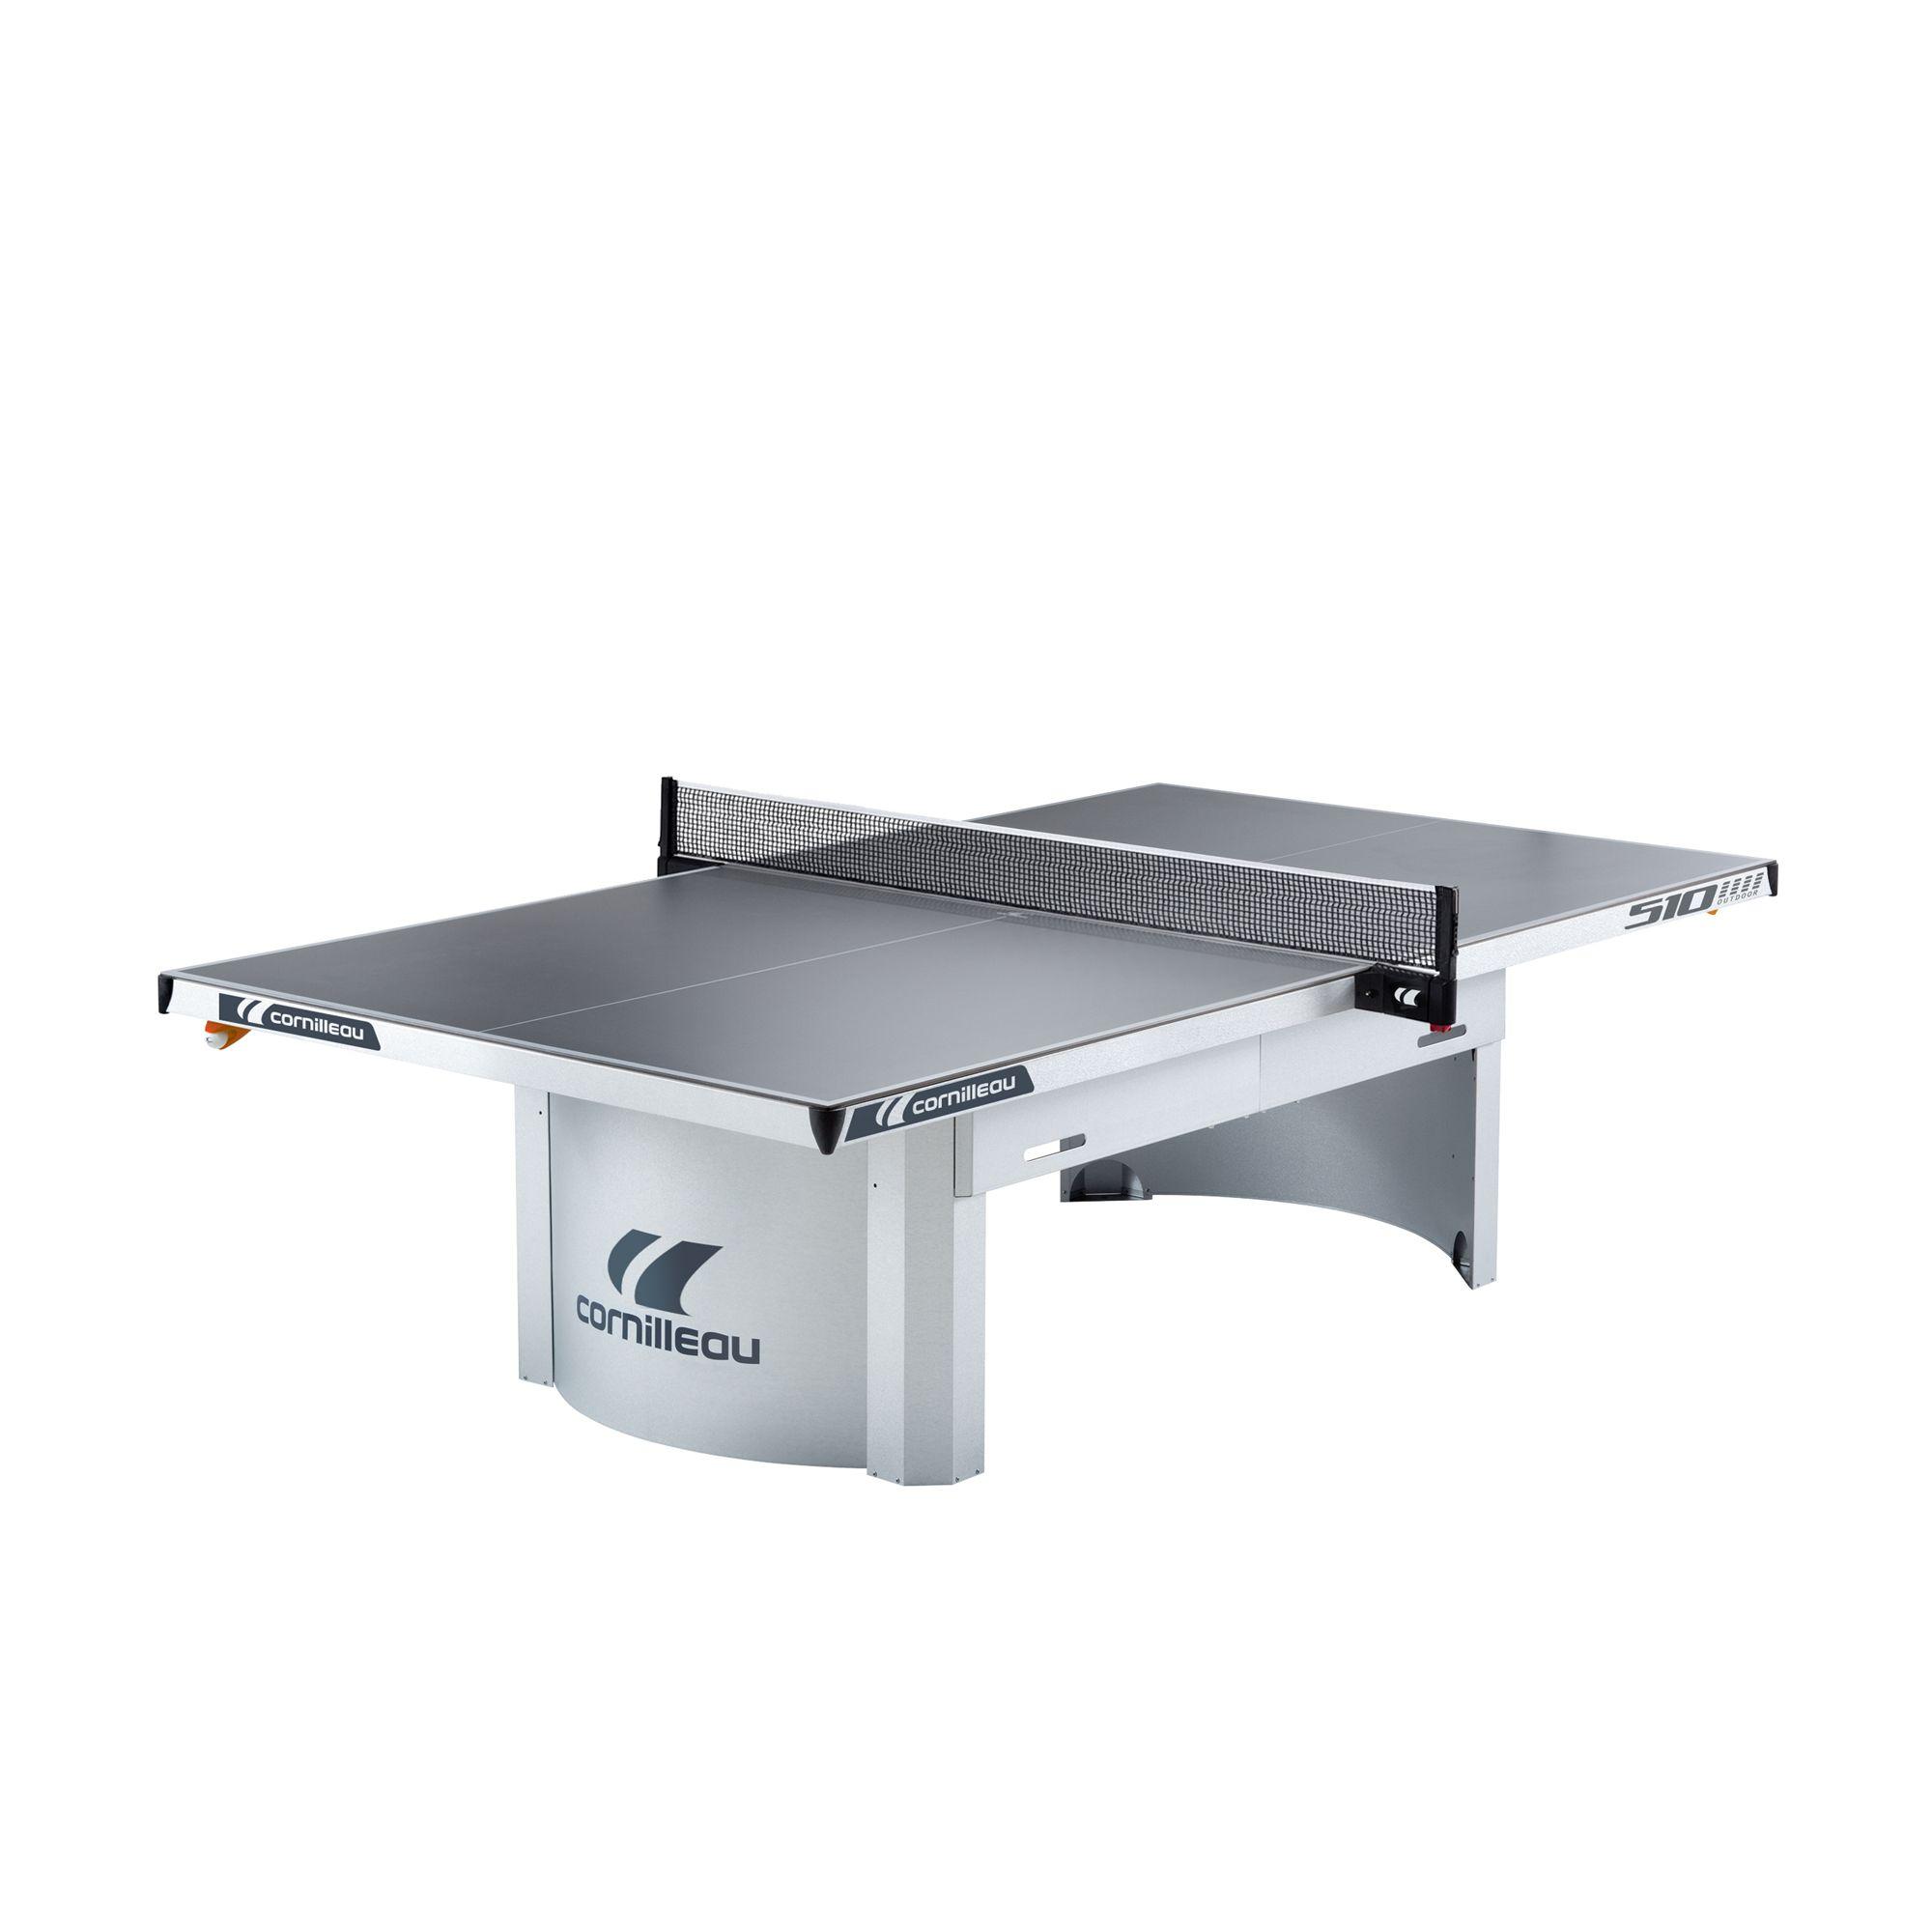 Cornilleau proline 510 static outdoor table tennis table - Weatherproof table tennis table ...